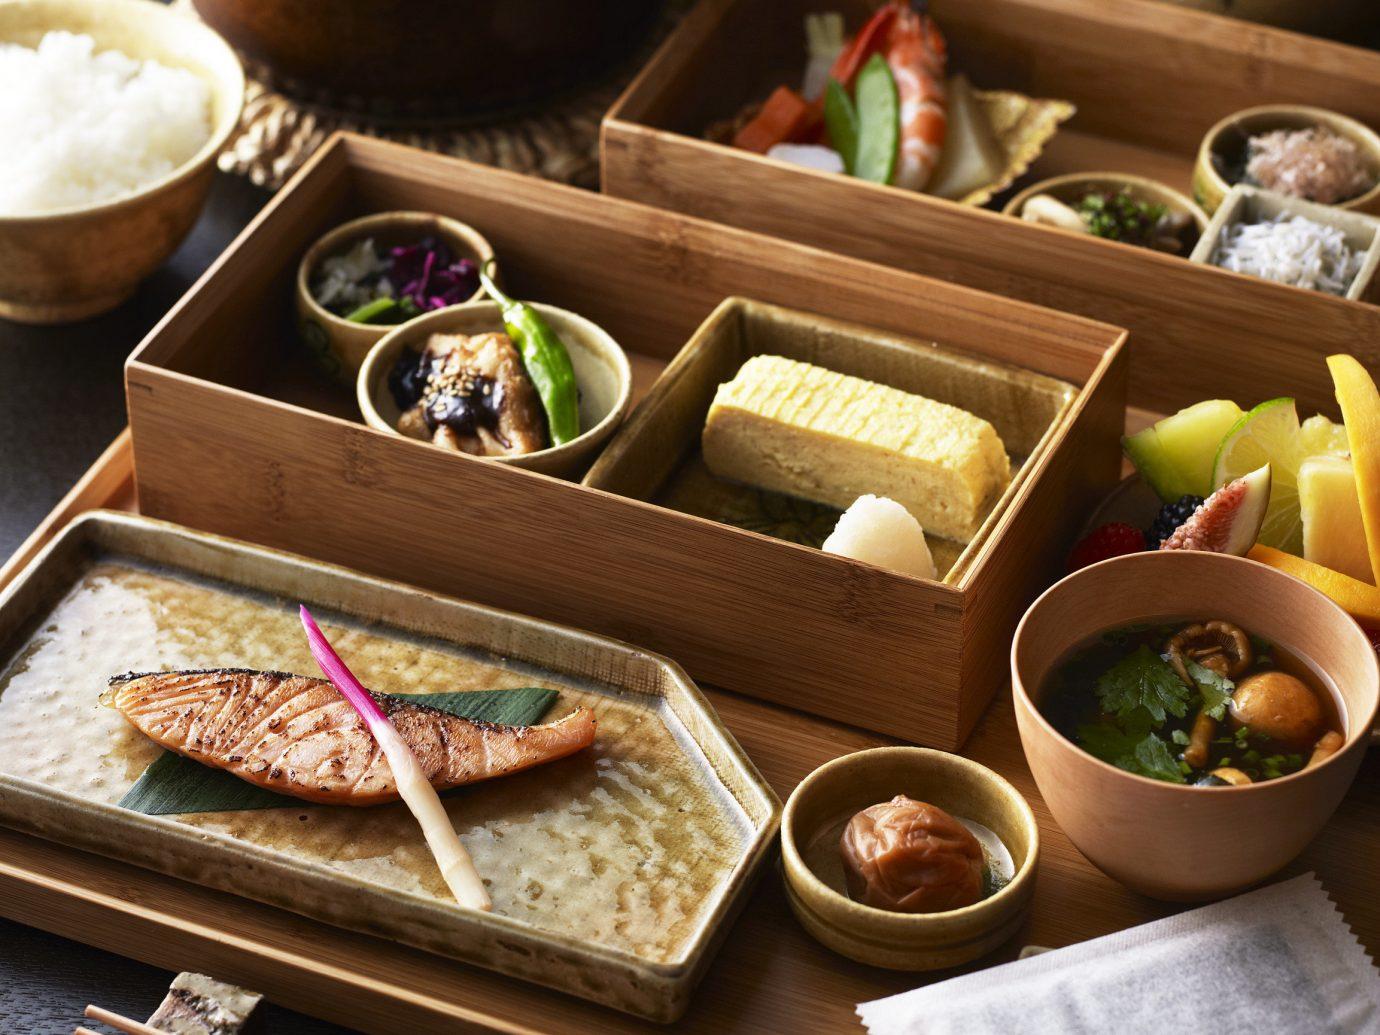 Food + Drink dish indoor cuisine food meal chopsticks breakfast asian food recipe kaiseki several